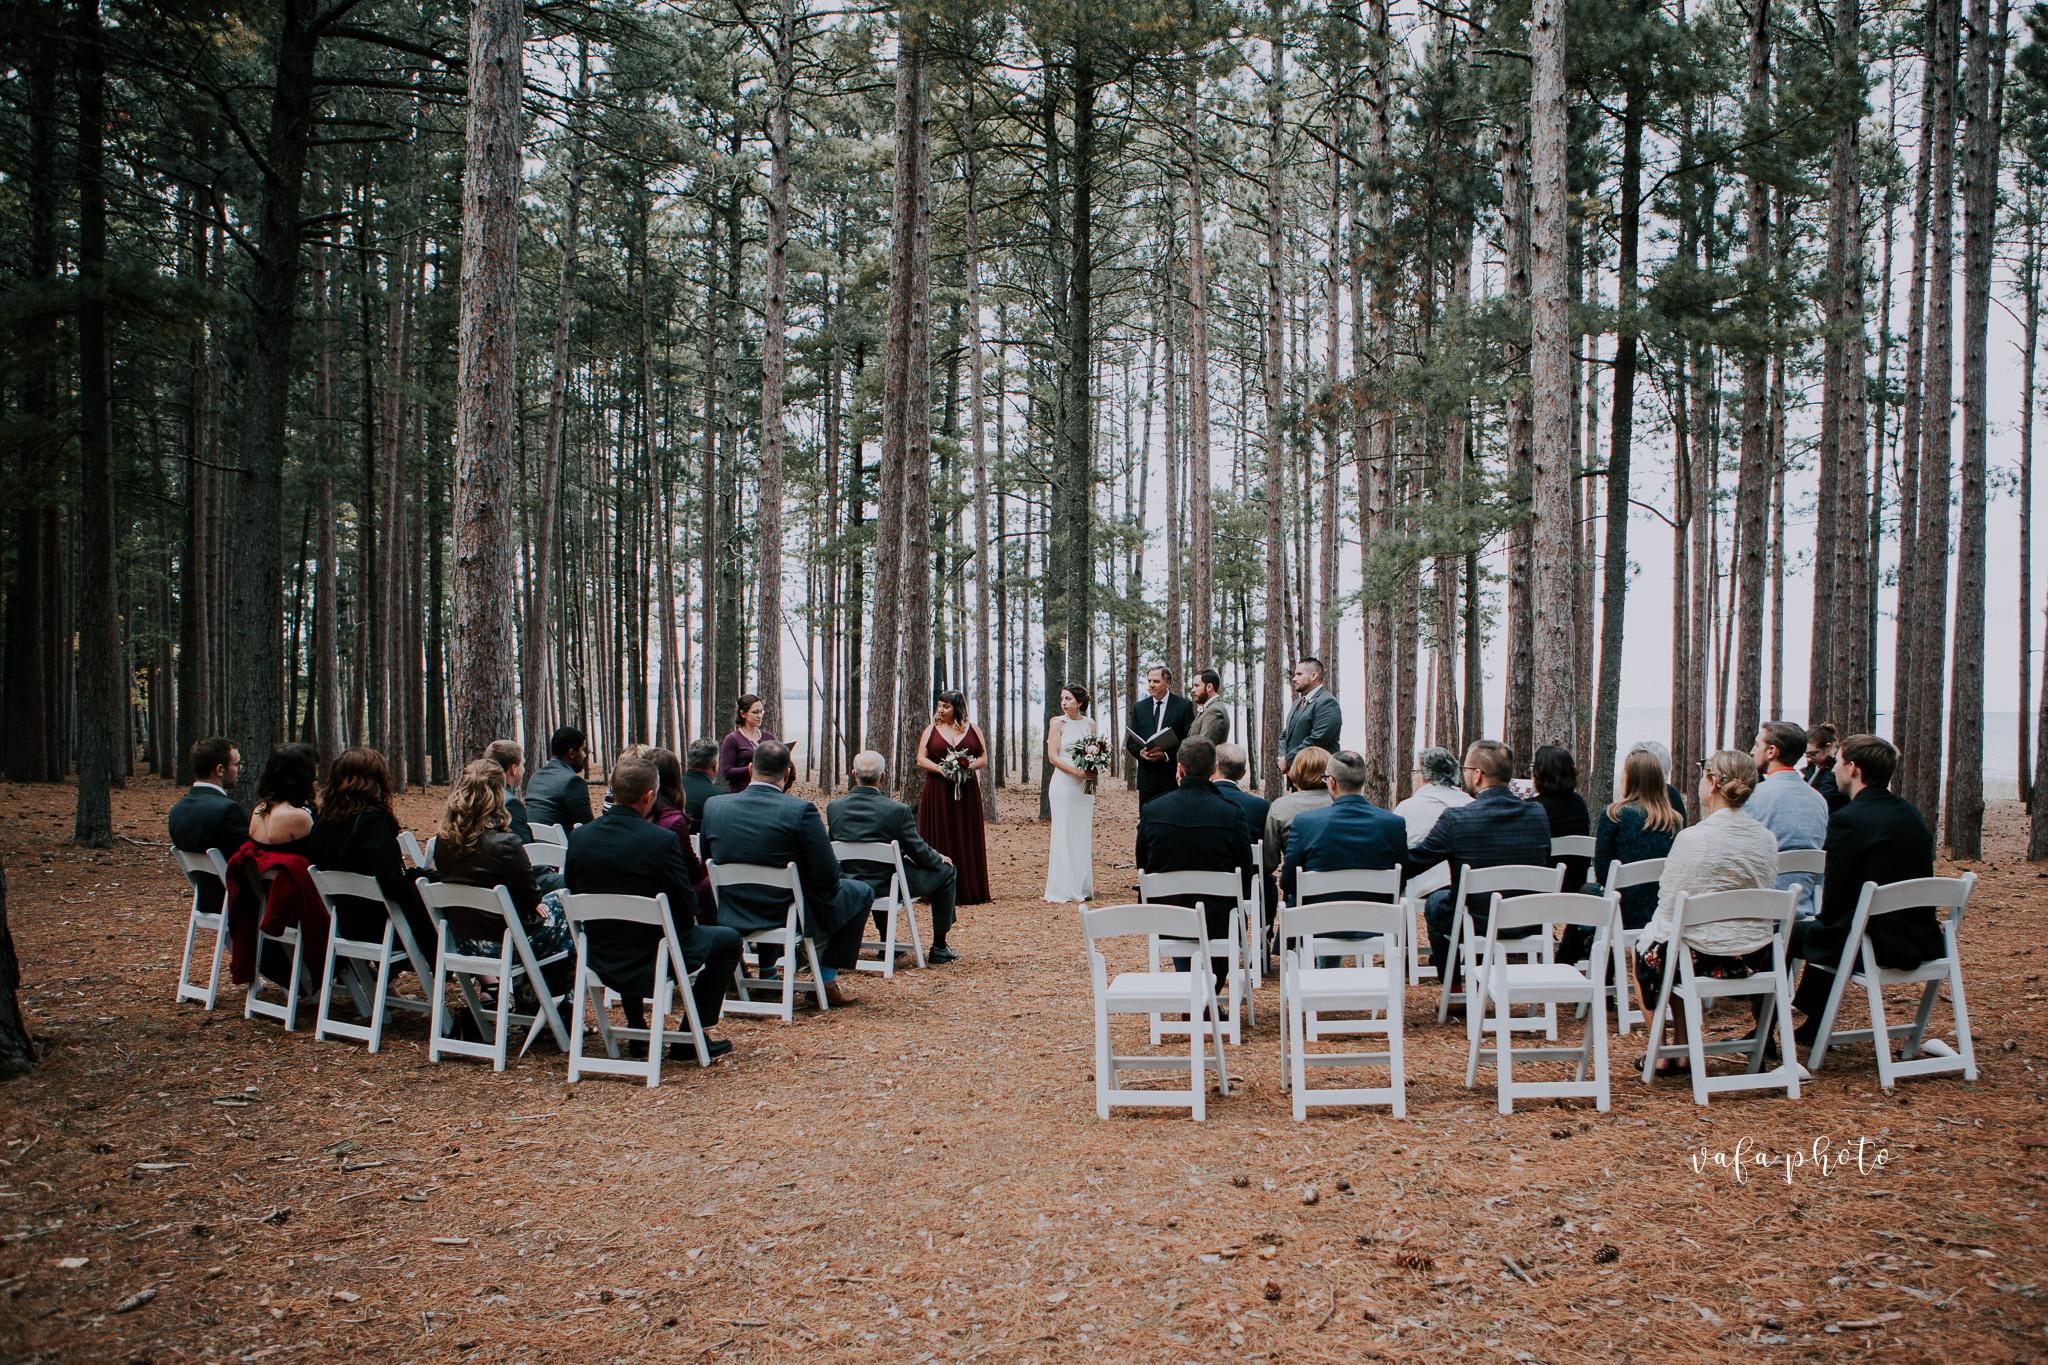 Little-Presque-Isle-Michigan-Wedding-Kim-Kyle-Vafa-Photo-207.jpg